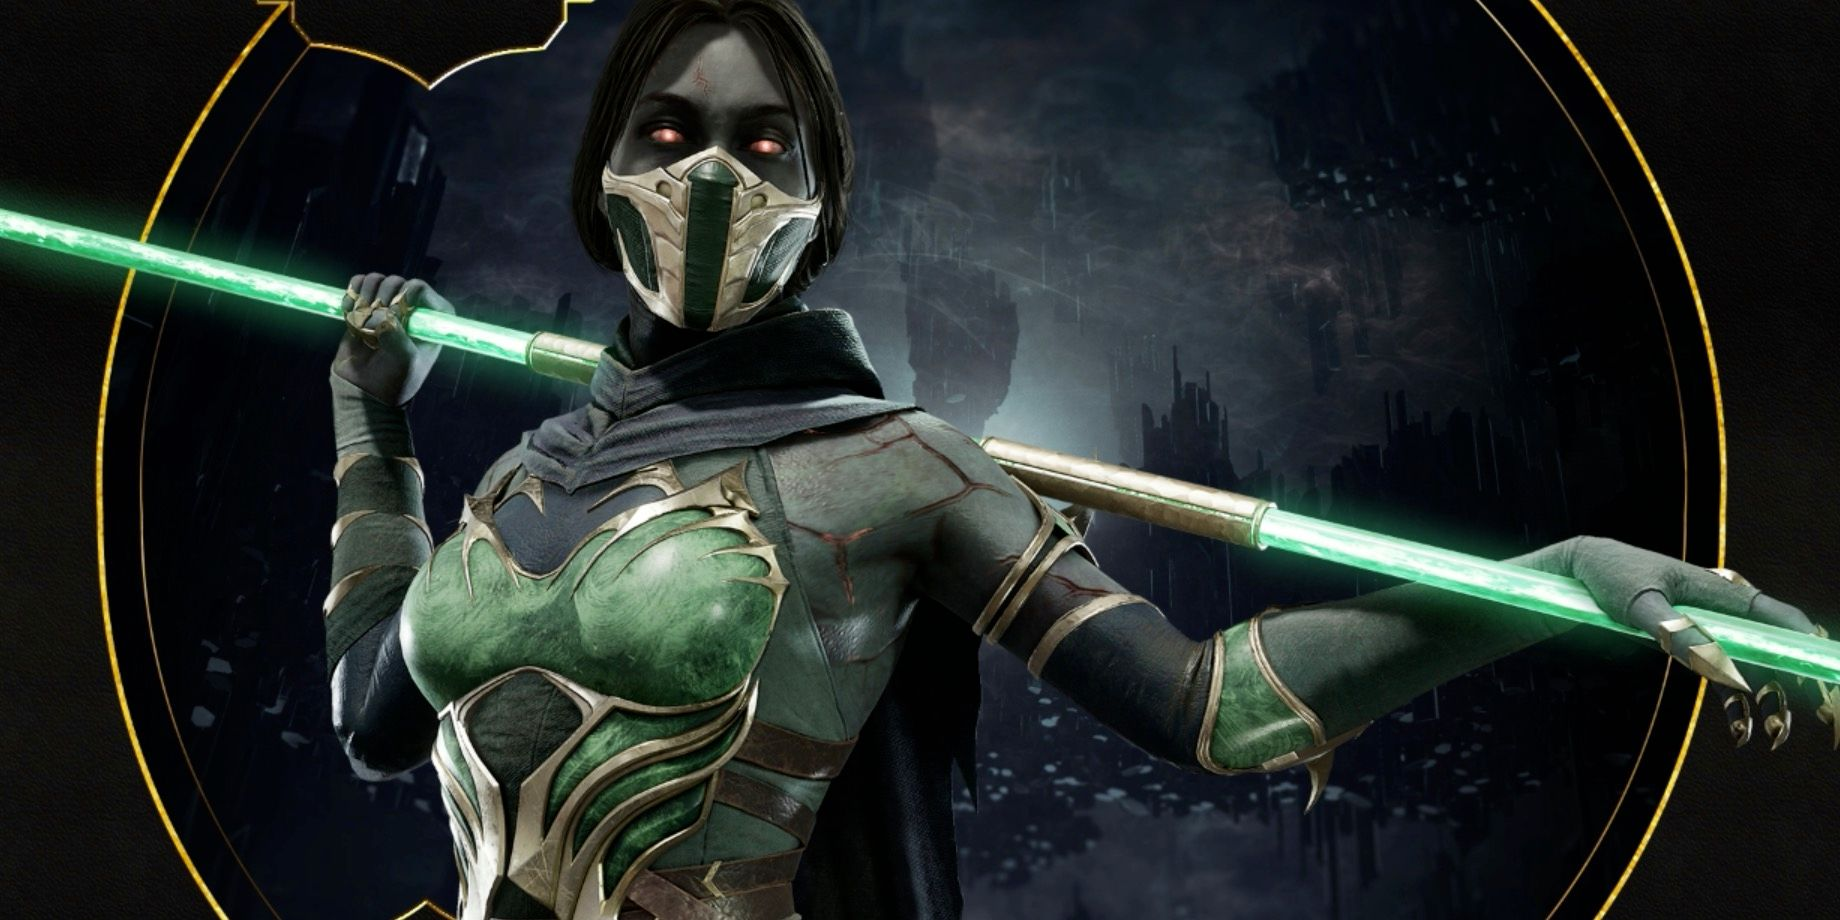 TV and Movie News New Mortal Kombat 11 Trailer Brings Back Classic